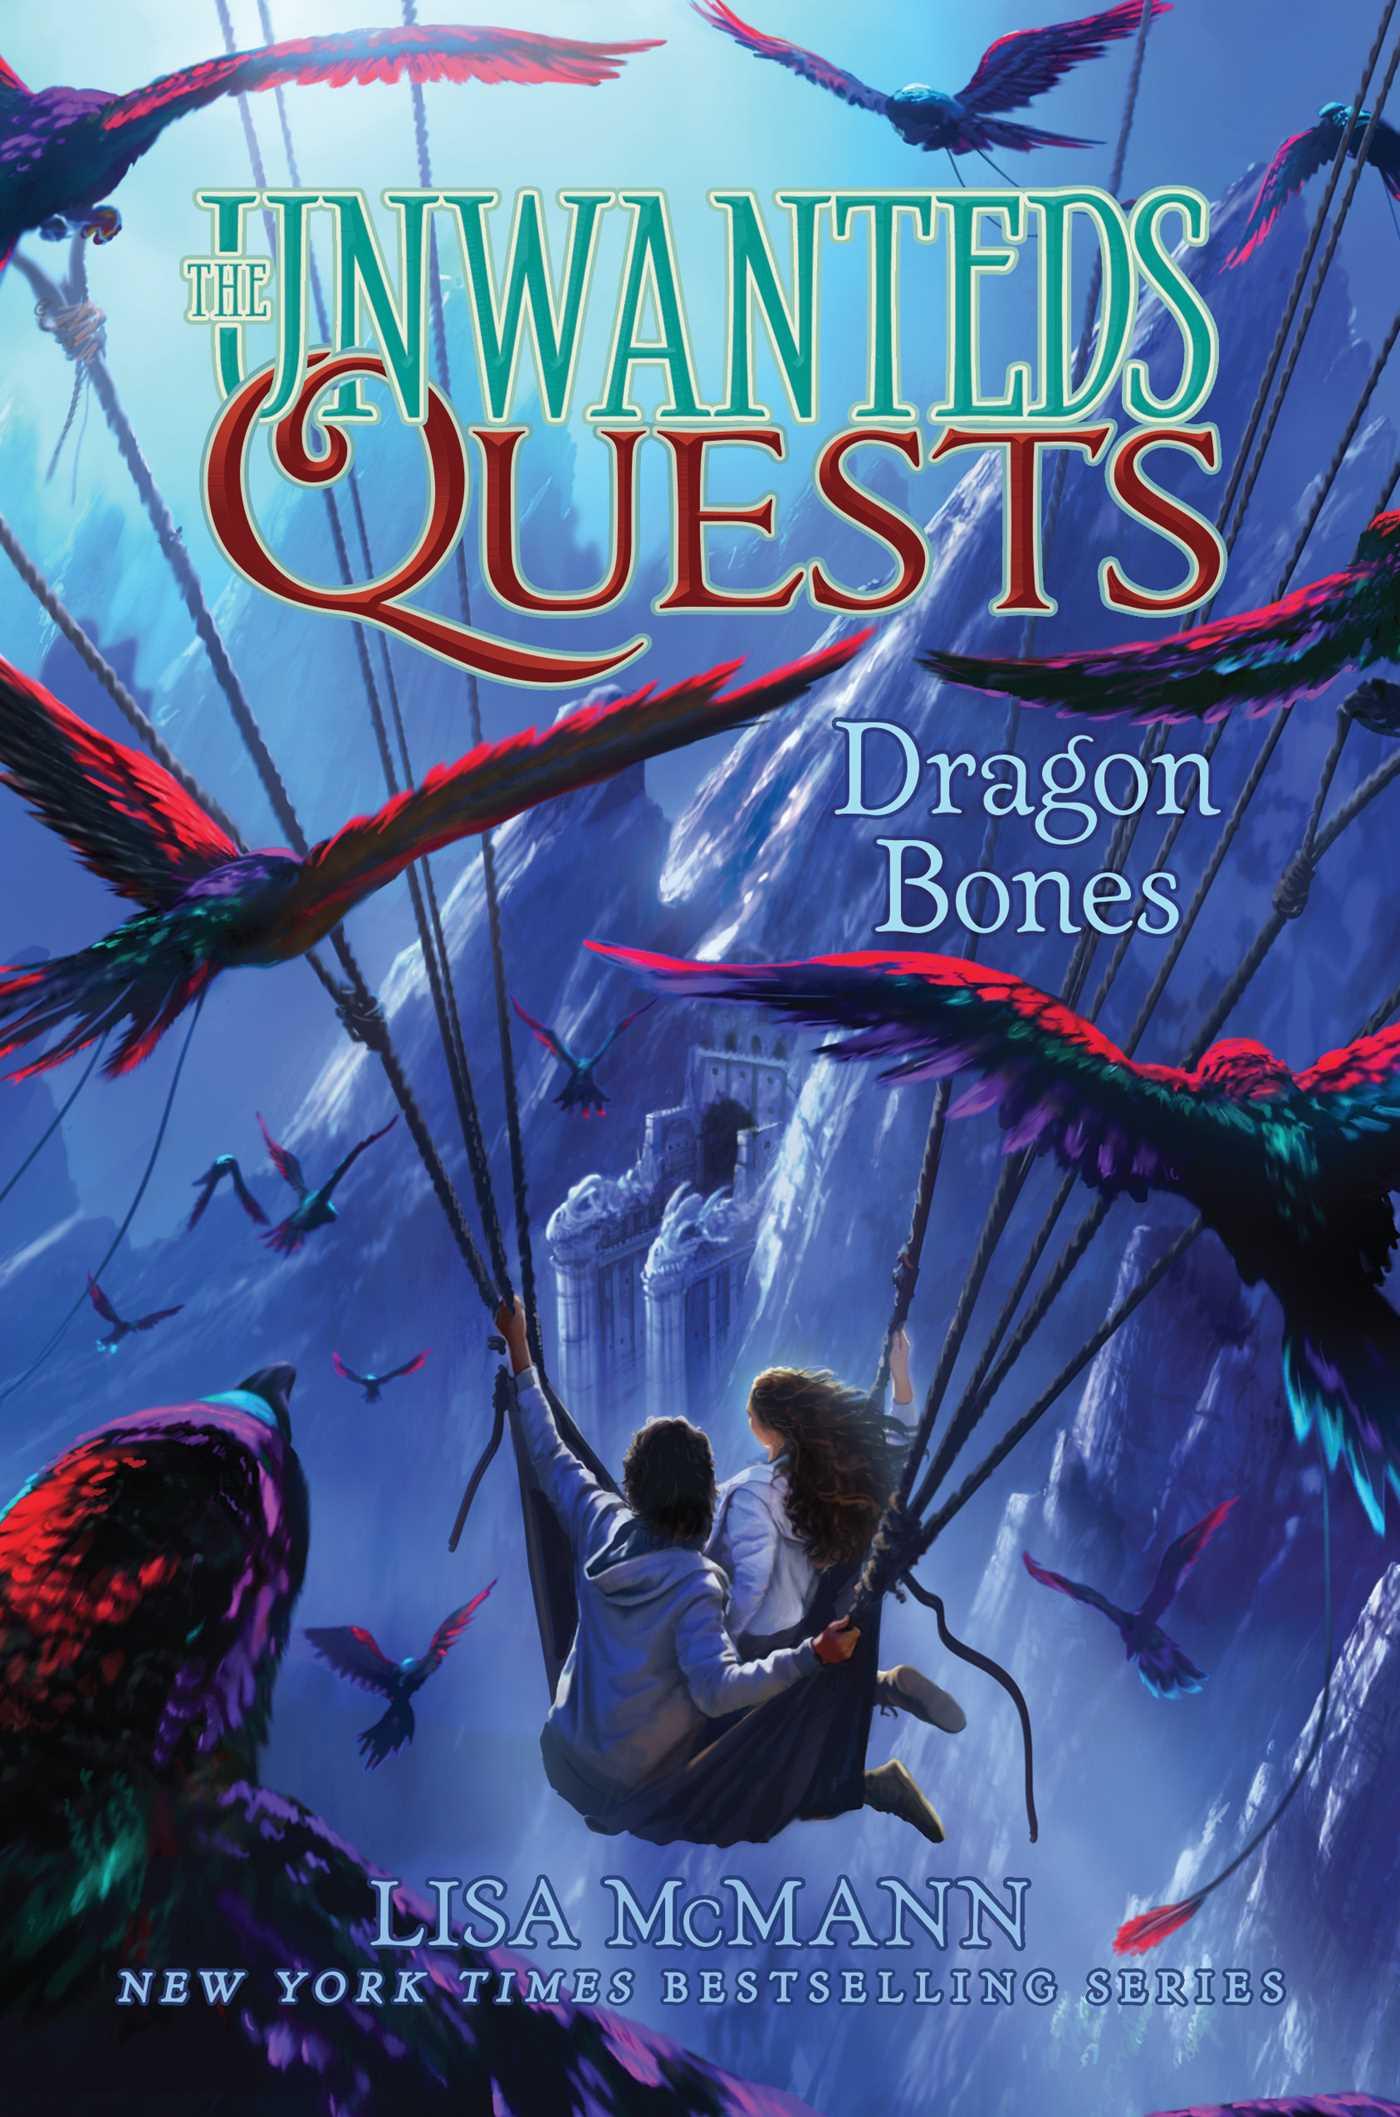 Dragon bones 9781481456845 hr